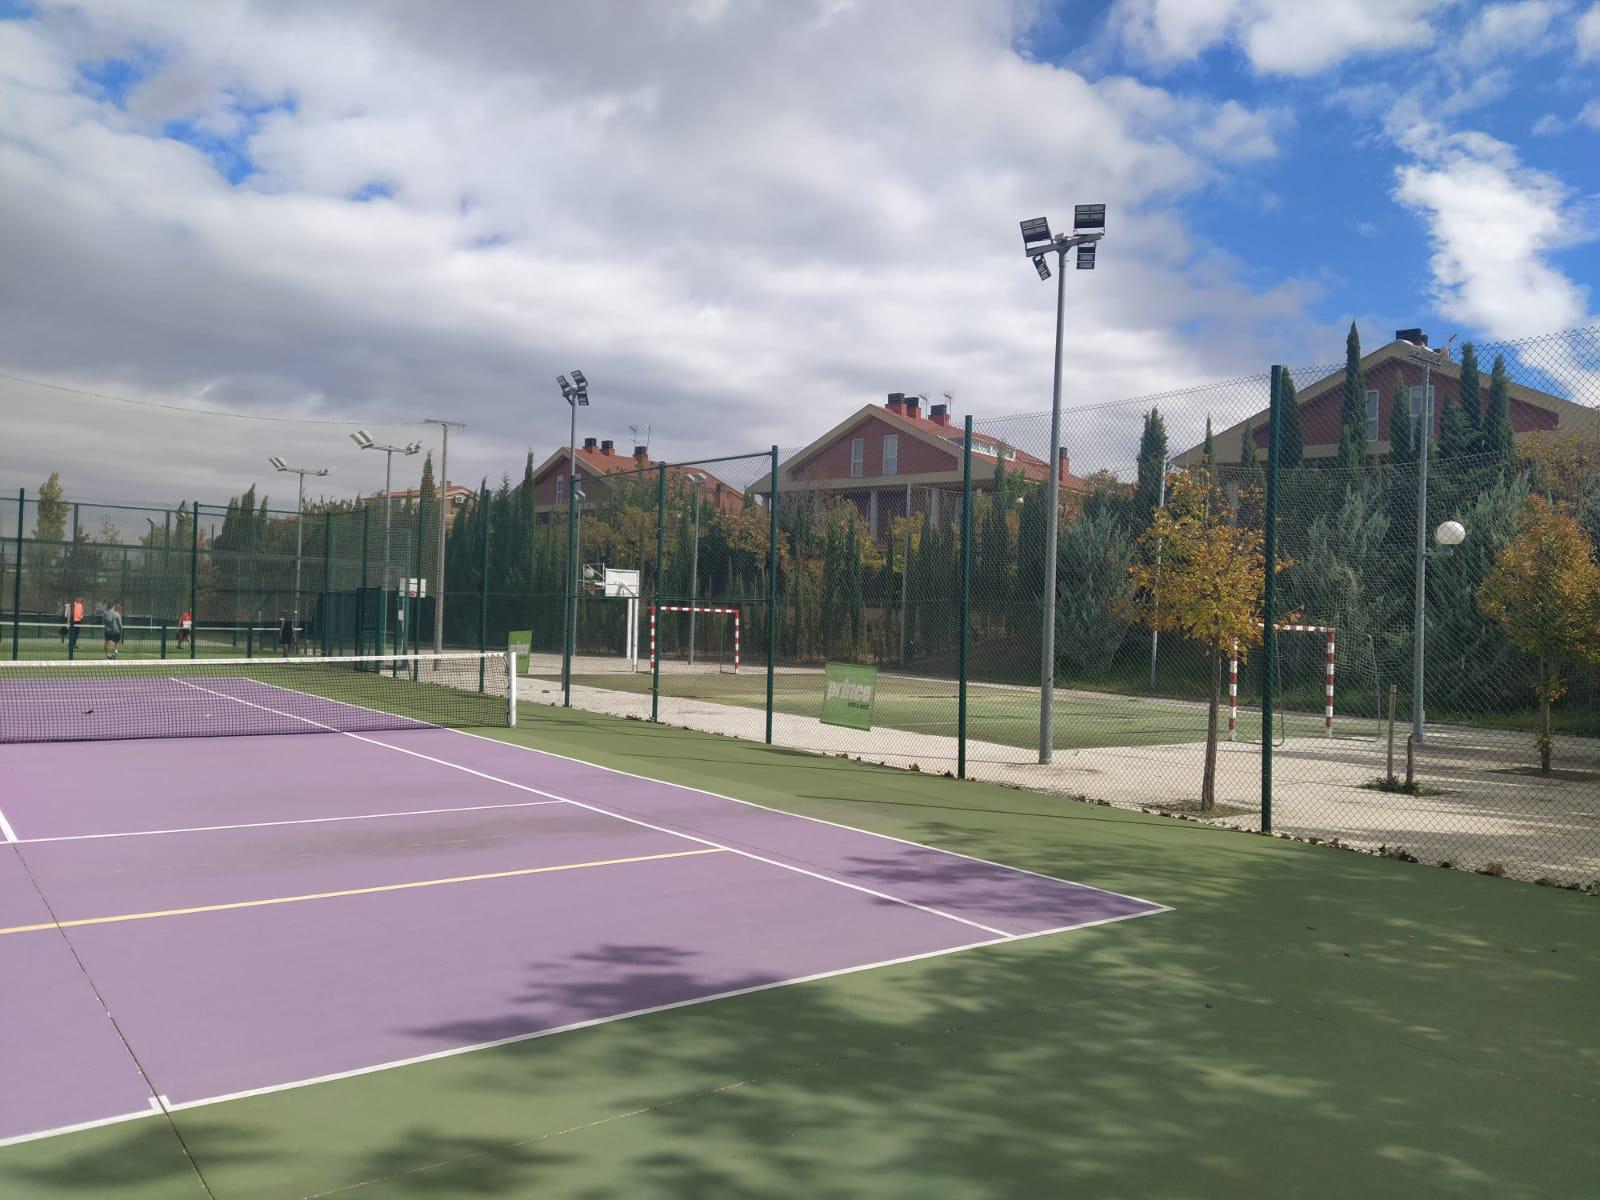 Andled - Club Tenis Montecanales